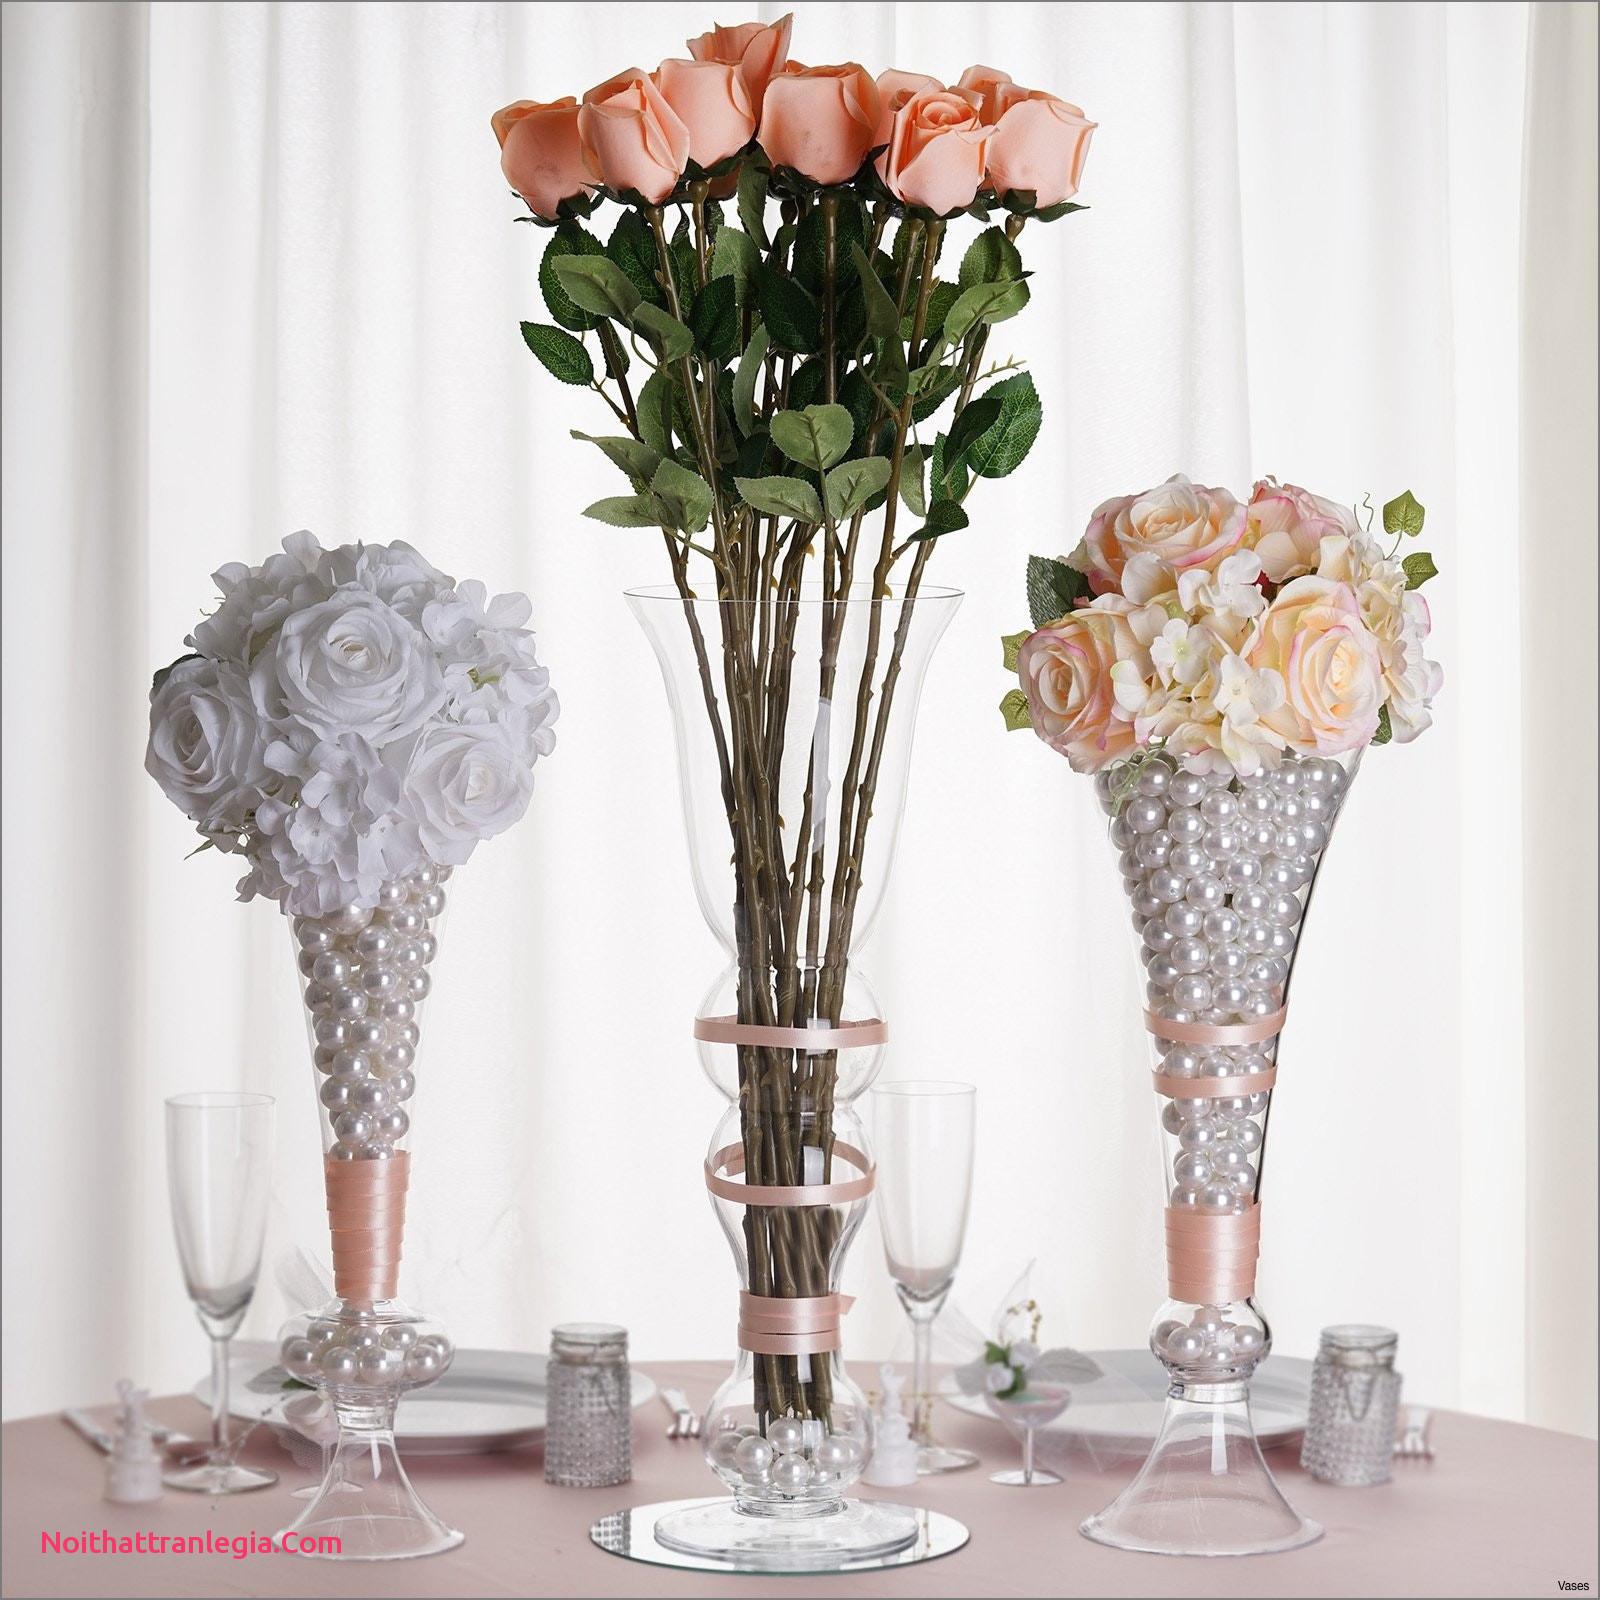 wedding centerpiece vases for sale of 20 how to clean flower vases noithattranlegia vases design regarding update clipart awesome flower vase table 04h vases tablei 0d clipart dining base end design